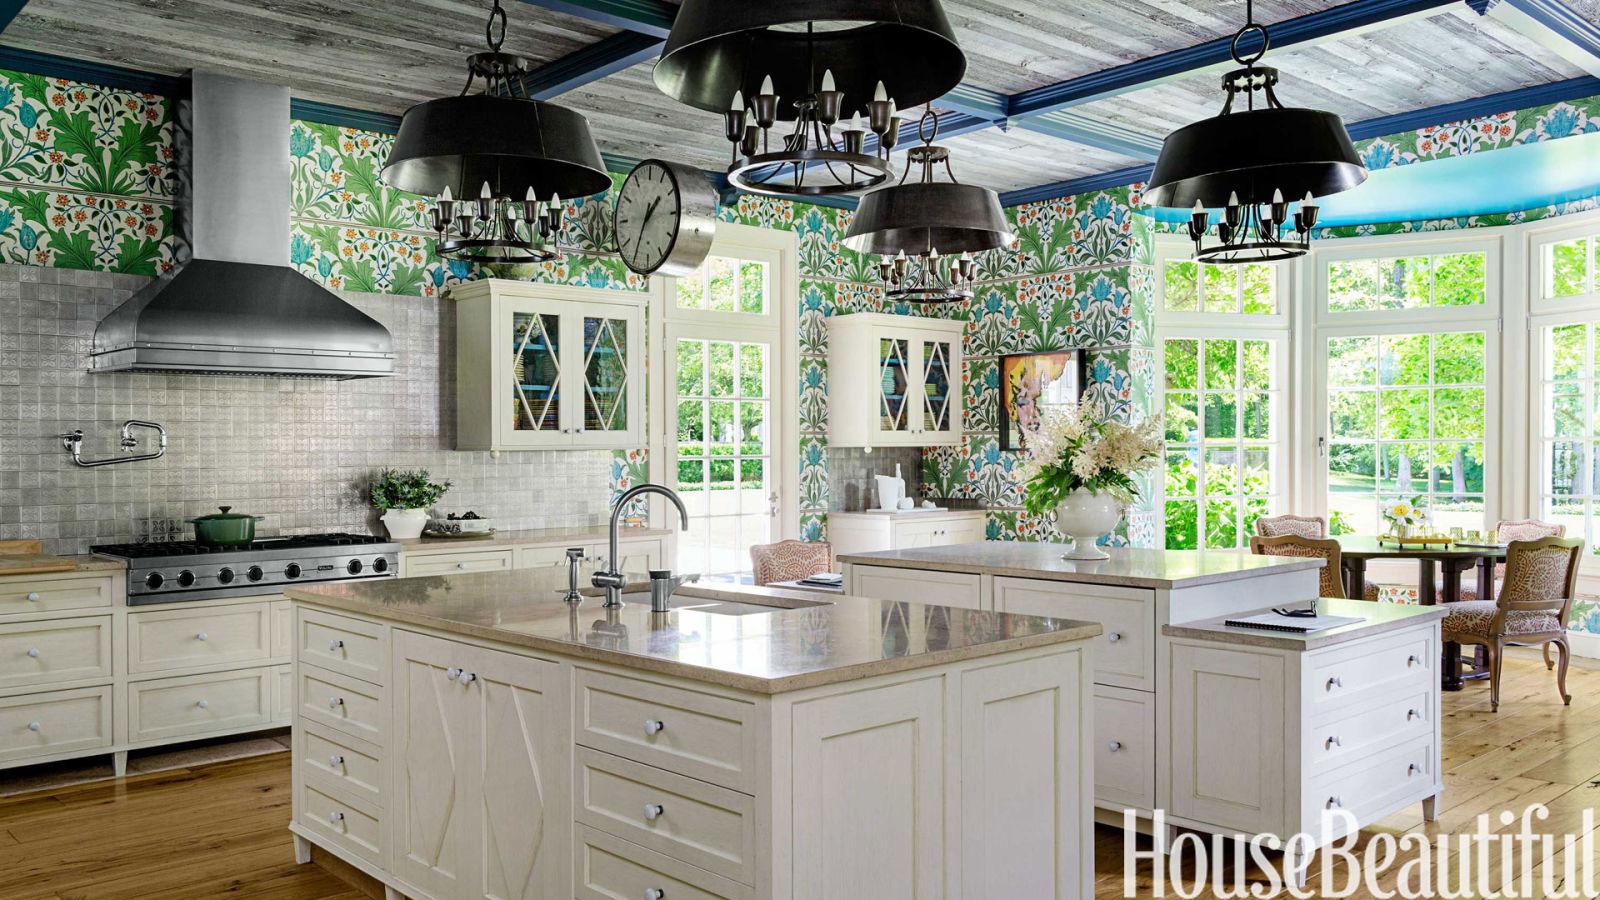 Designer Kitchen Wallpaper William Morris Wallpaper Kitchen Stephen Sills Kitchen Design